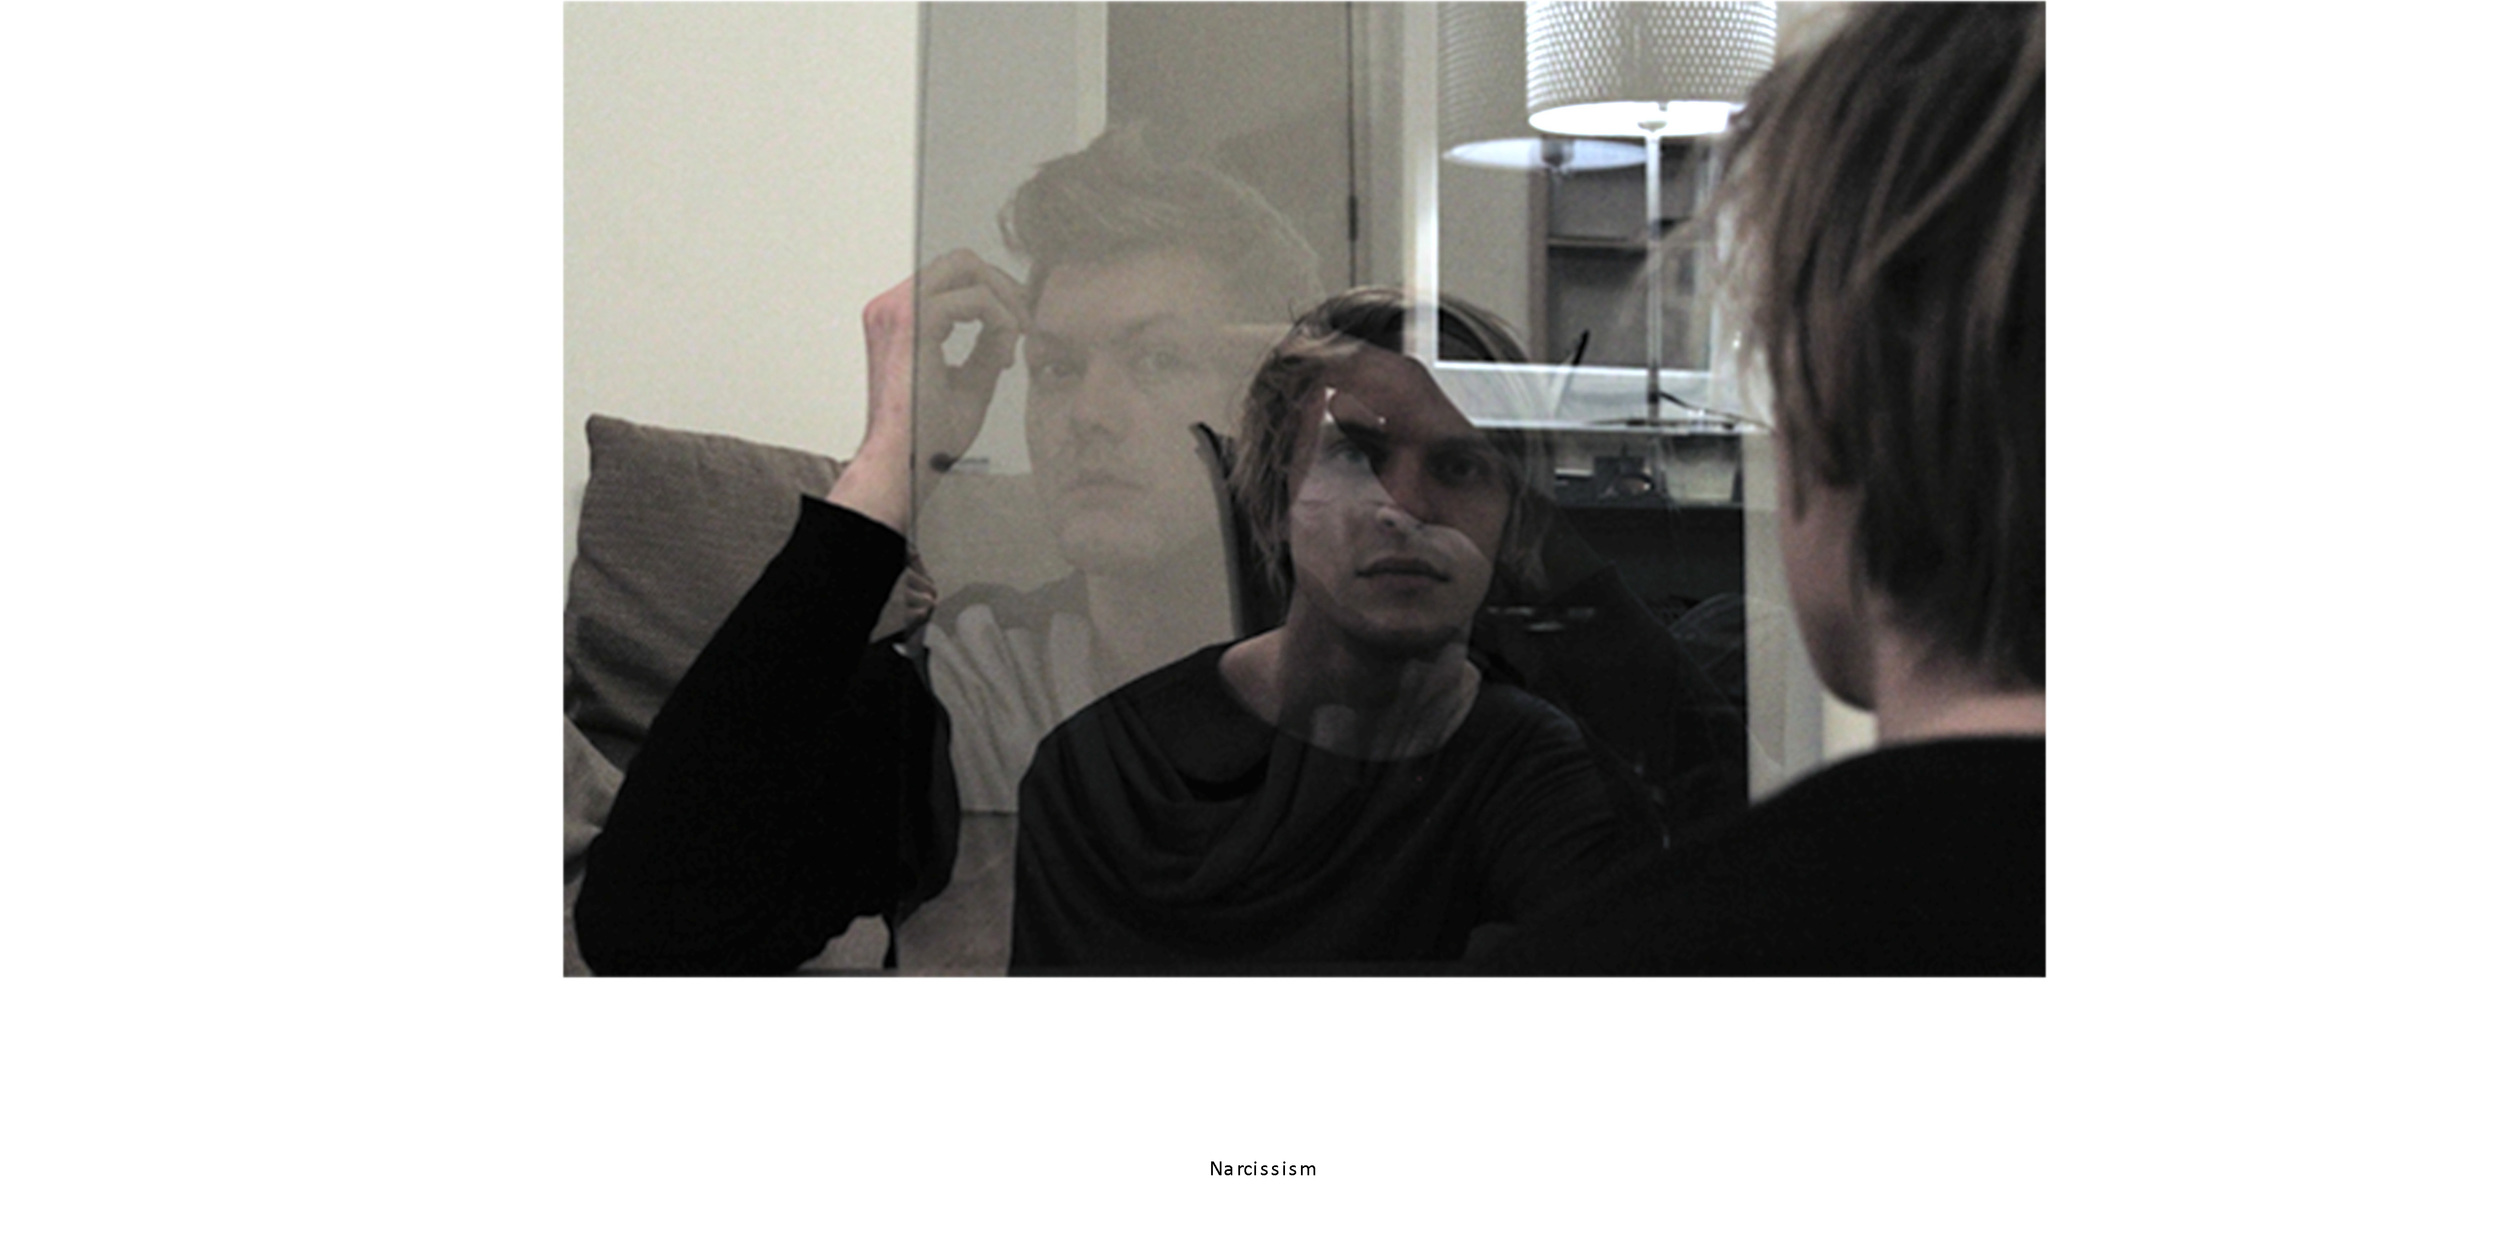 narcissism.jpg